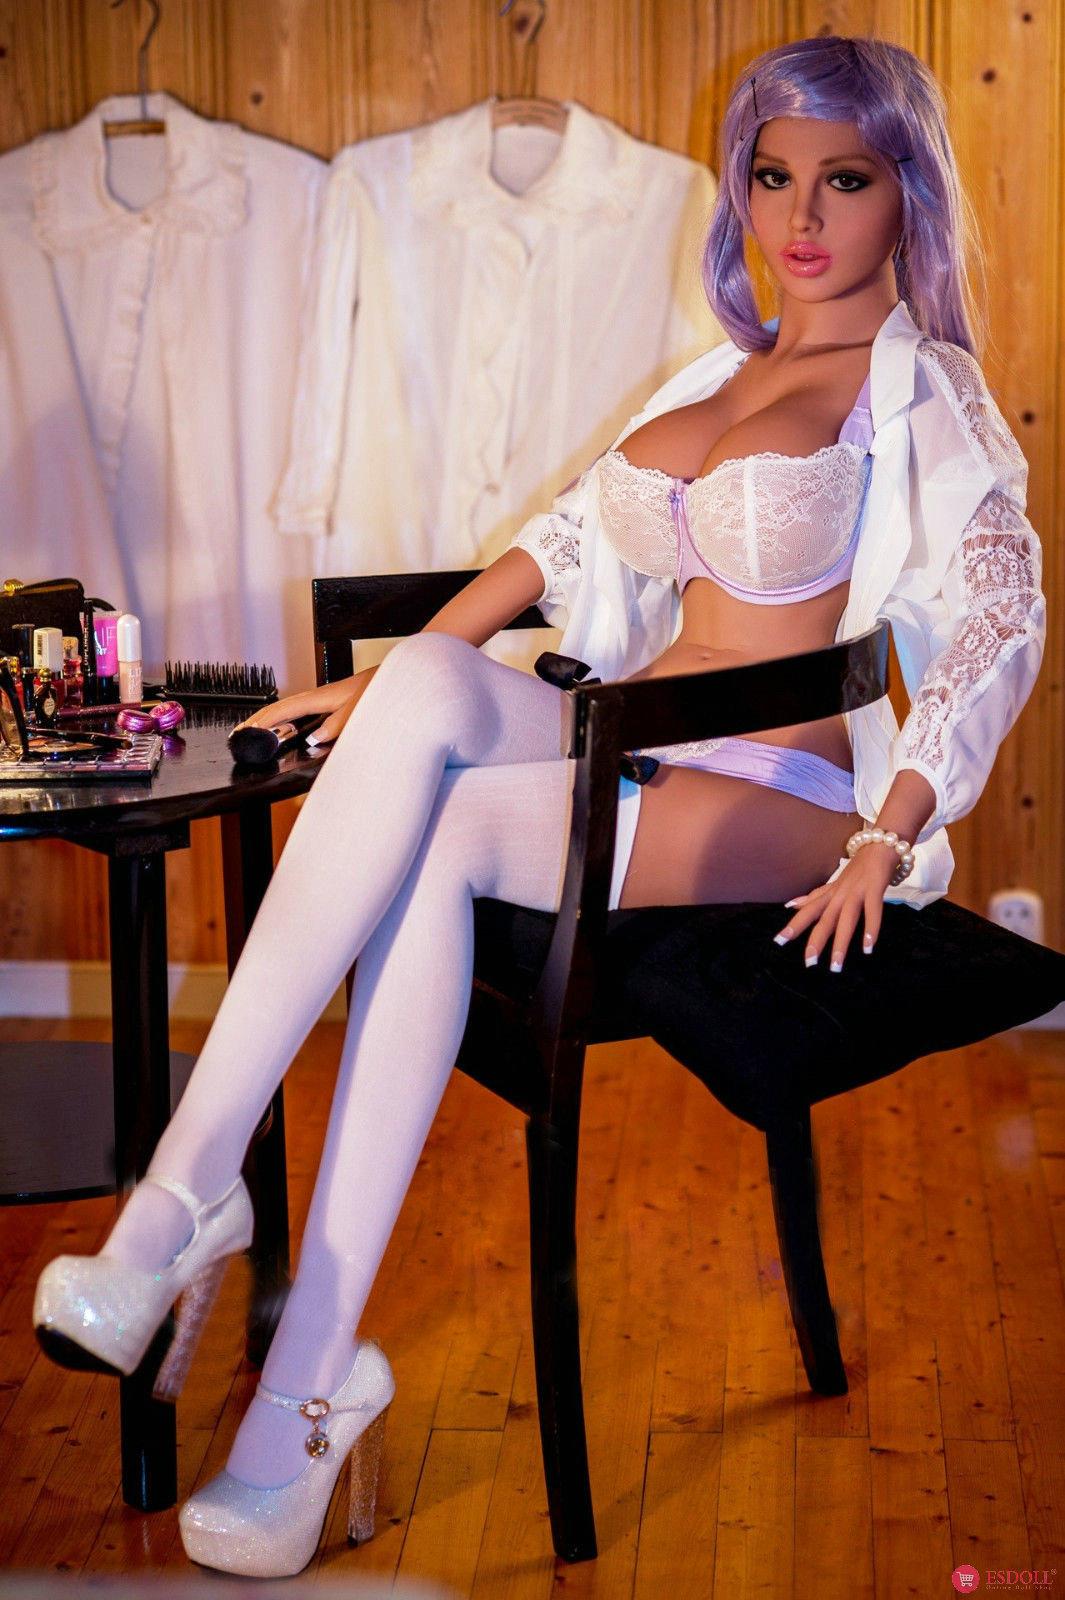 daisy-158cm-5-18ft-tan-skin-silicone-sex-angel-doll - 3